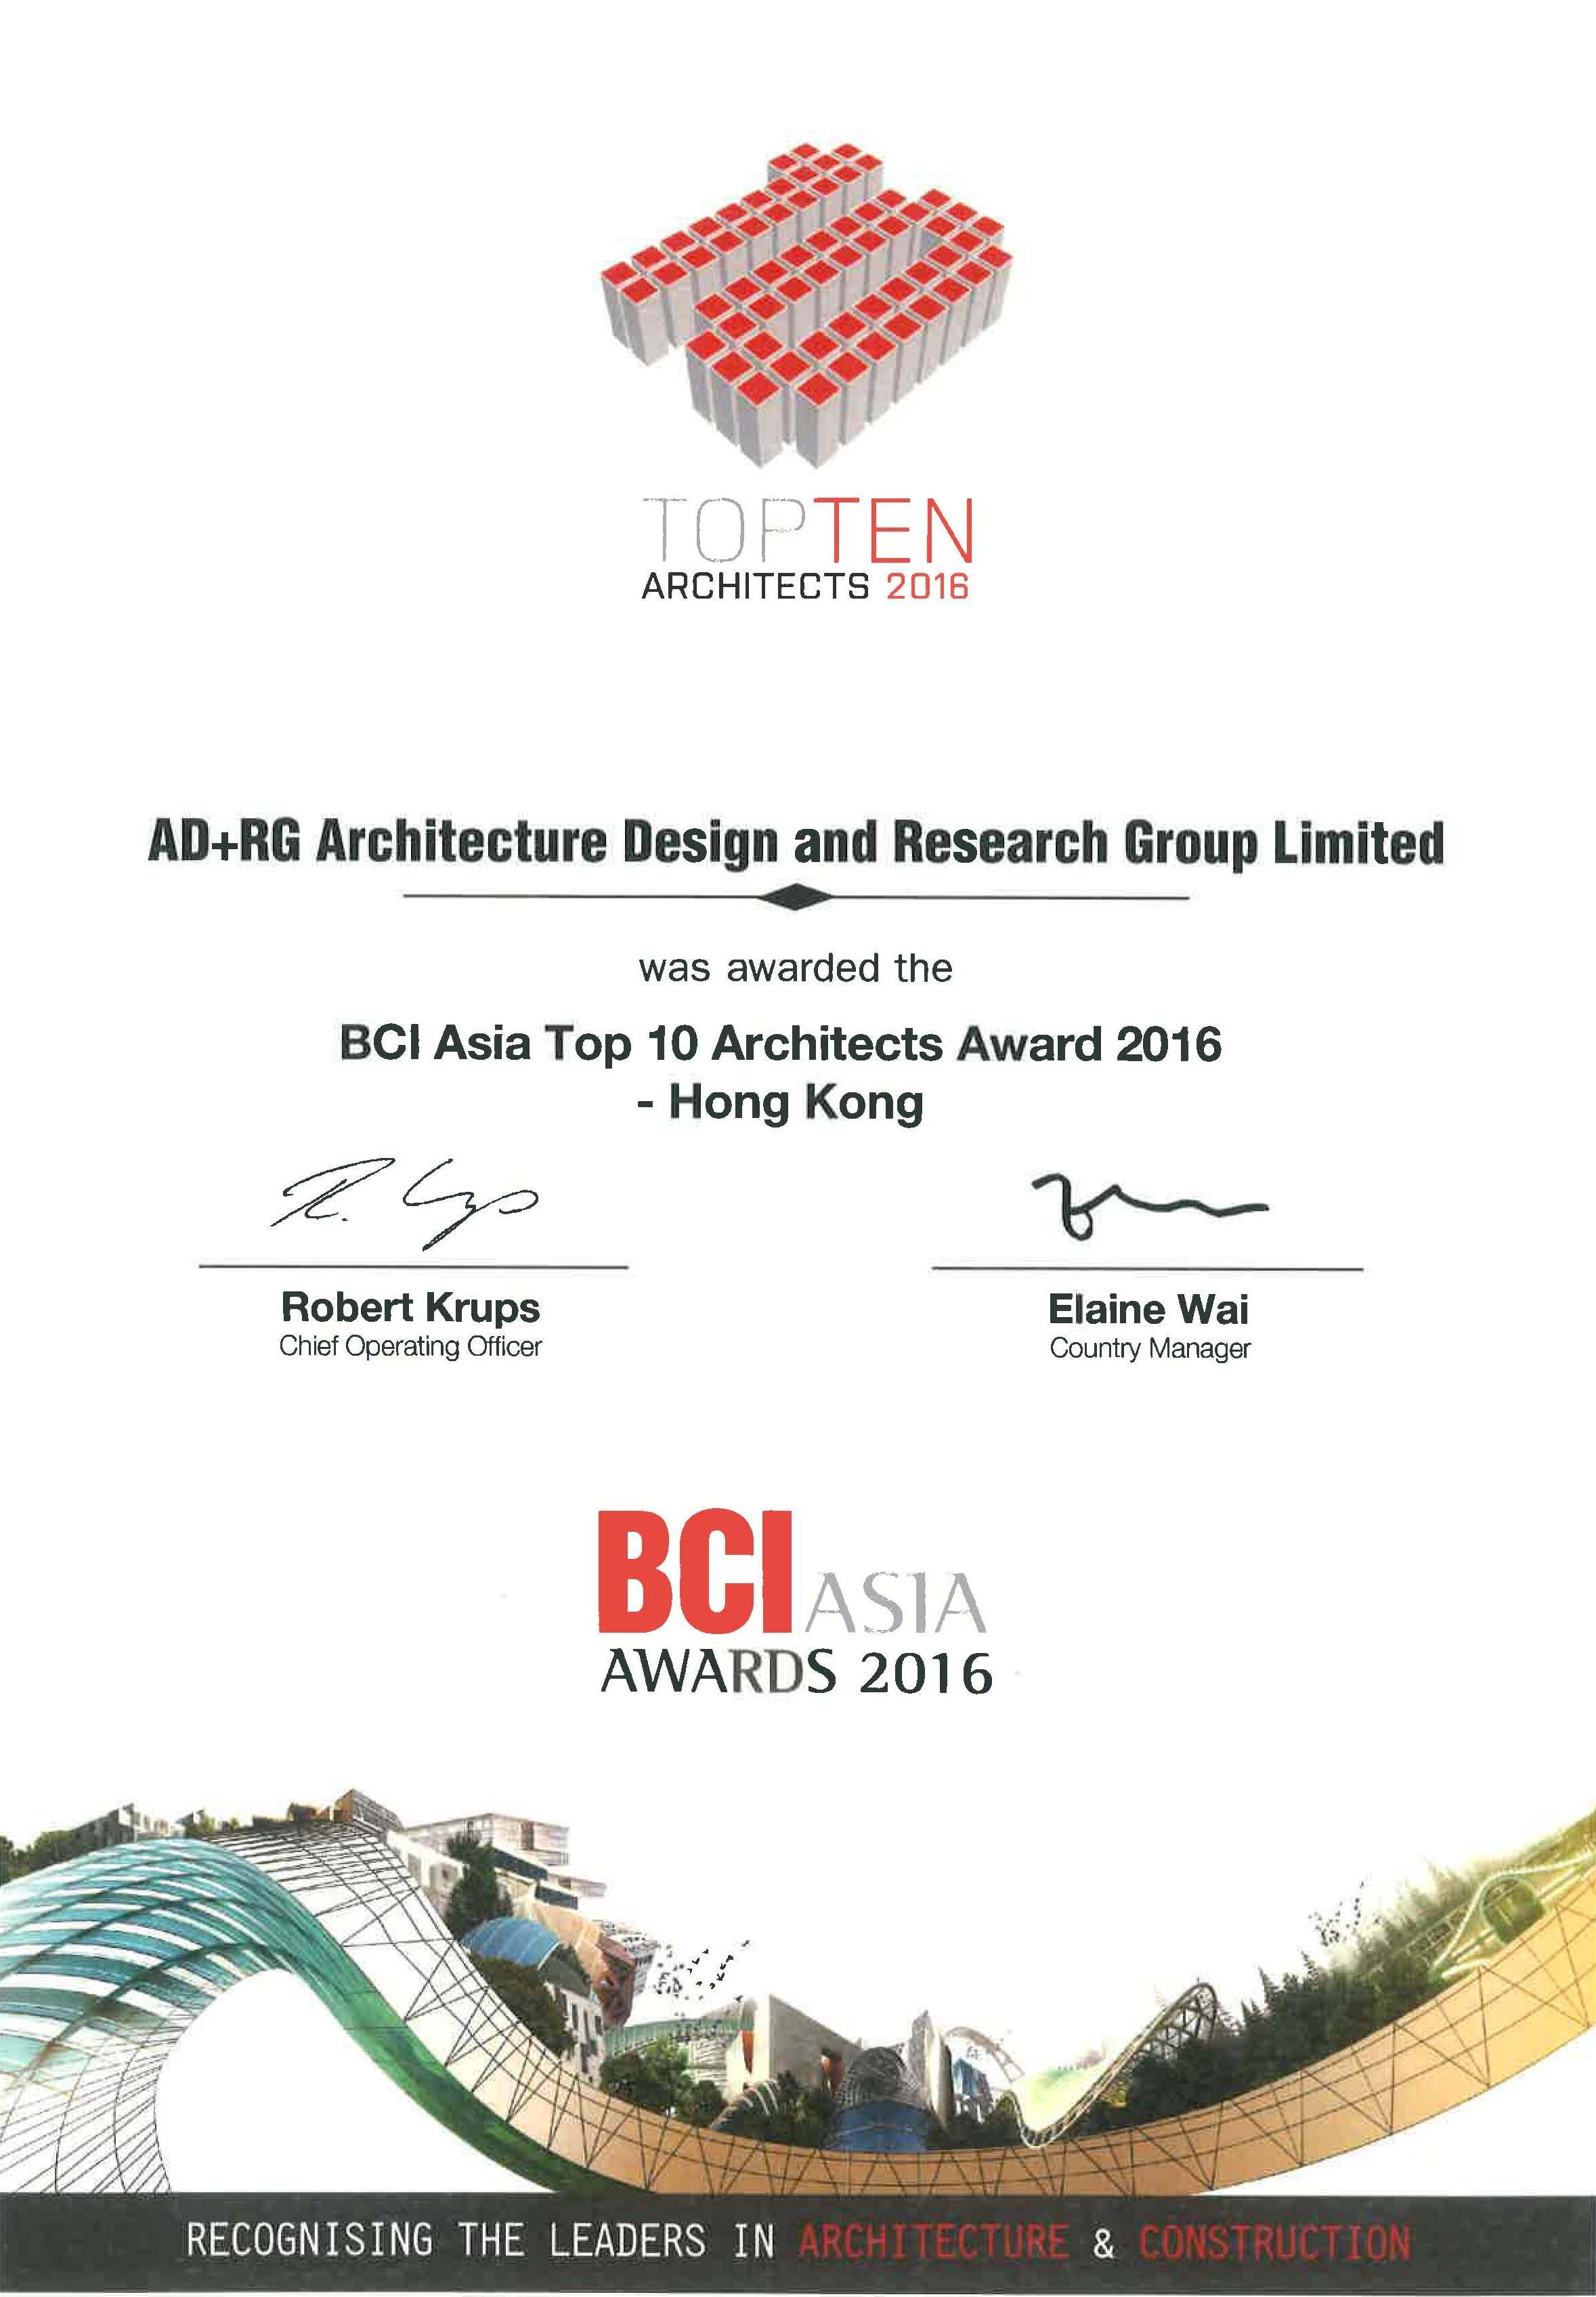 Top Ten Architect awards